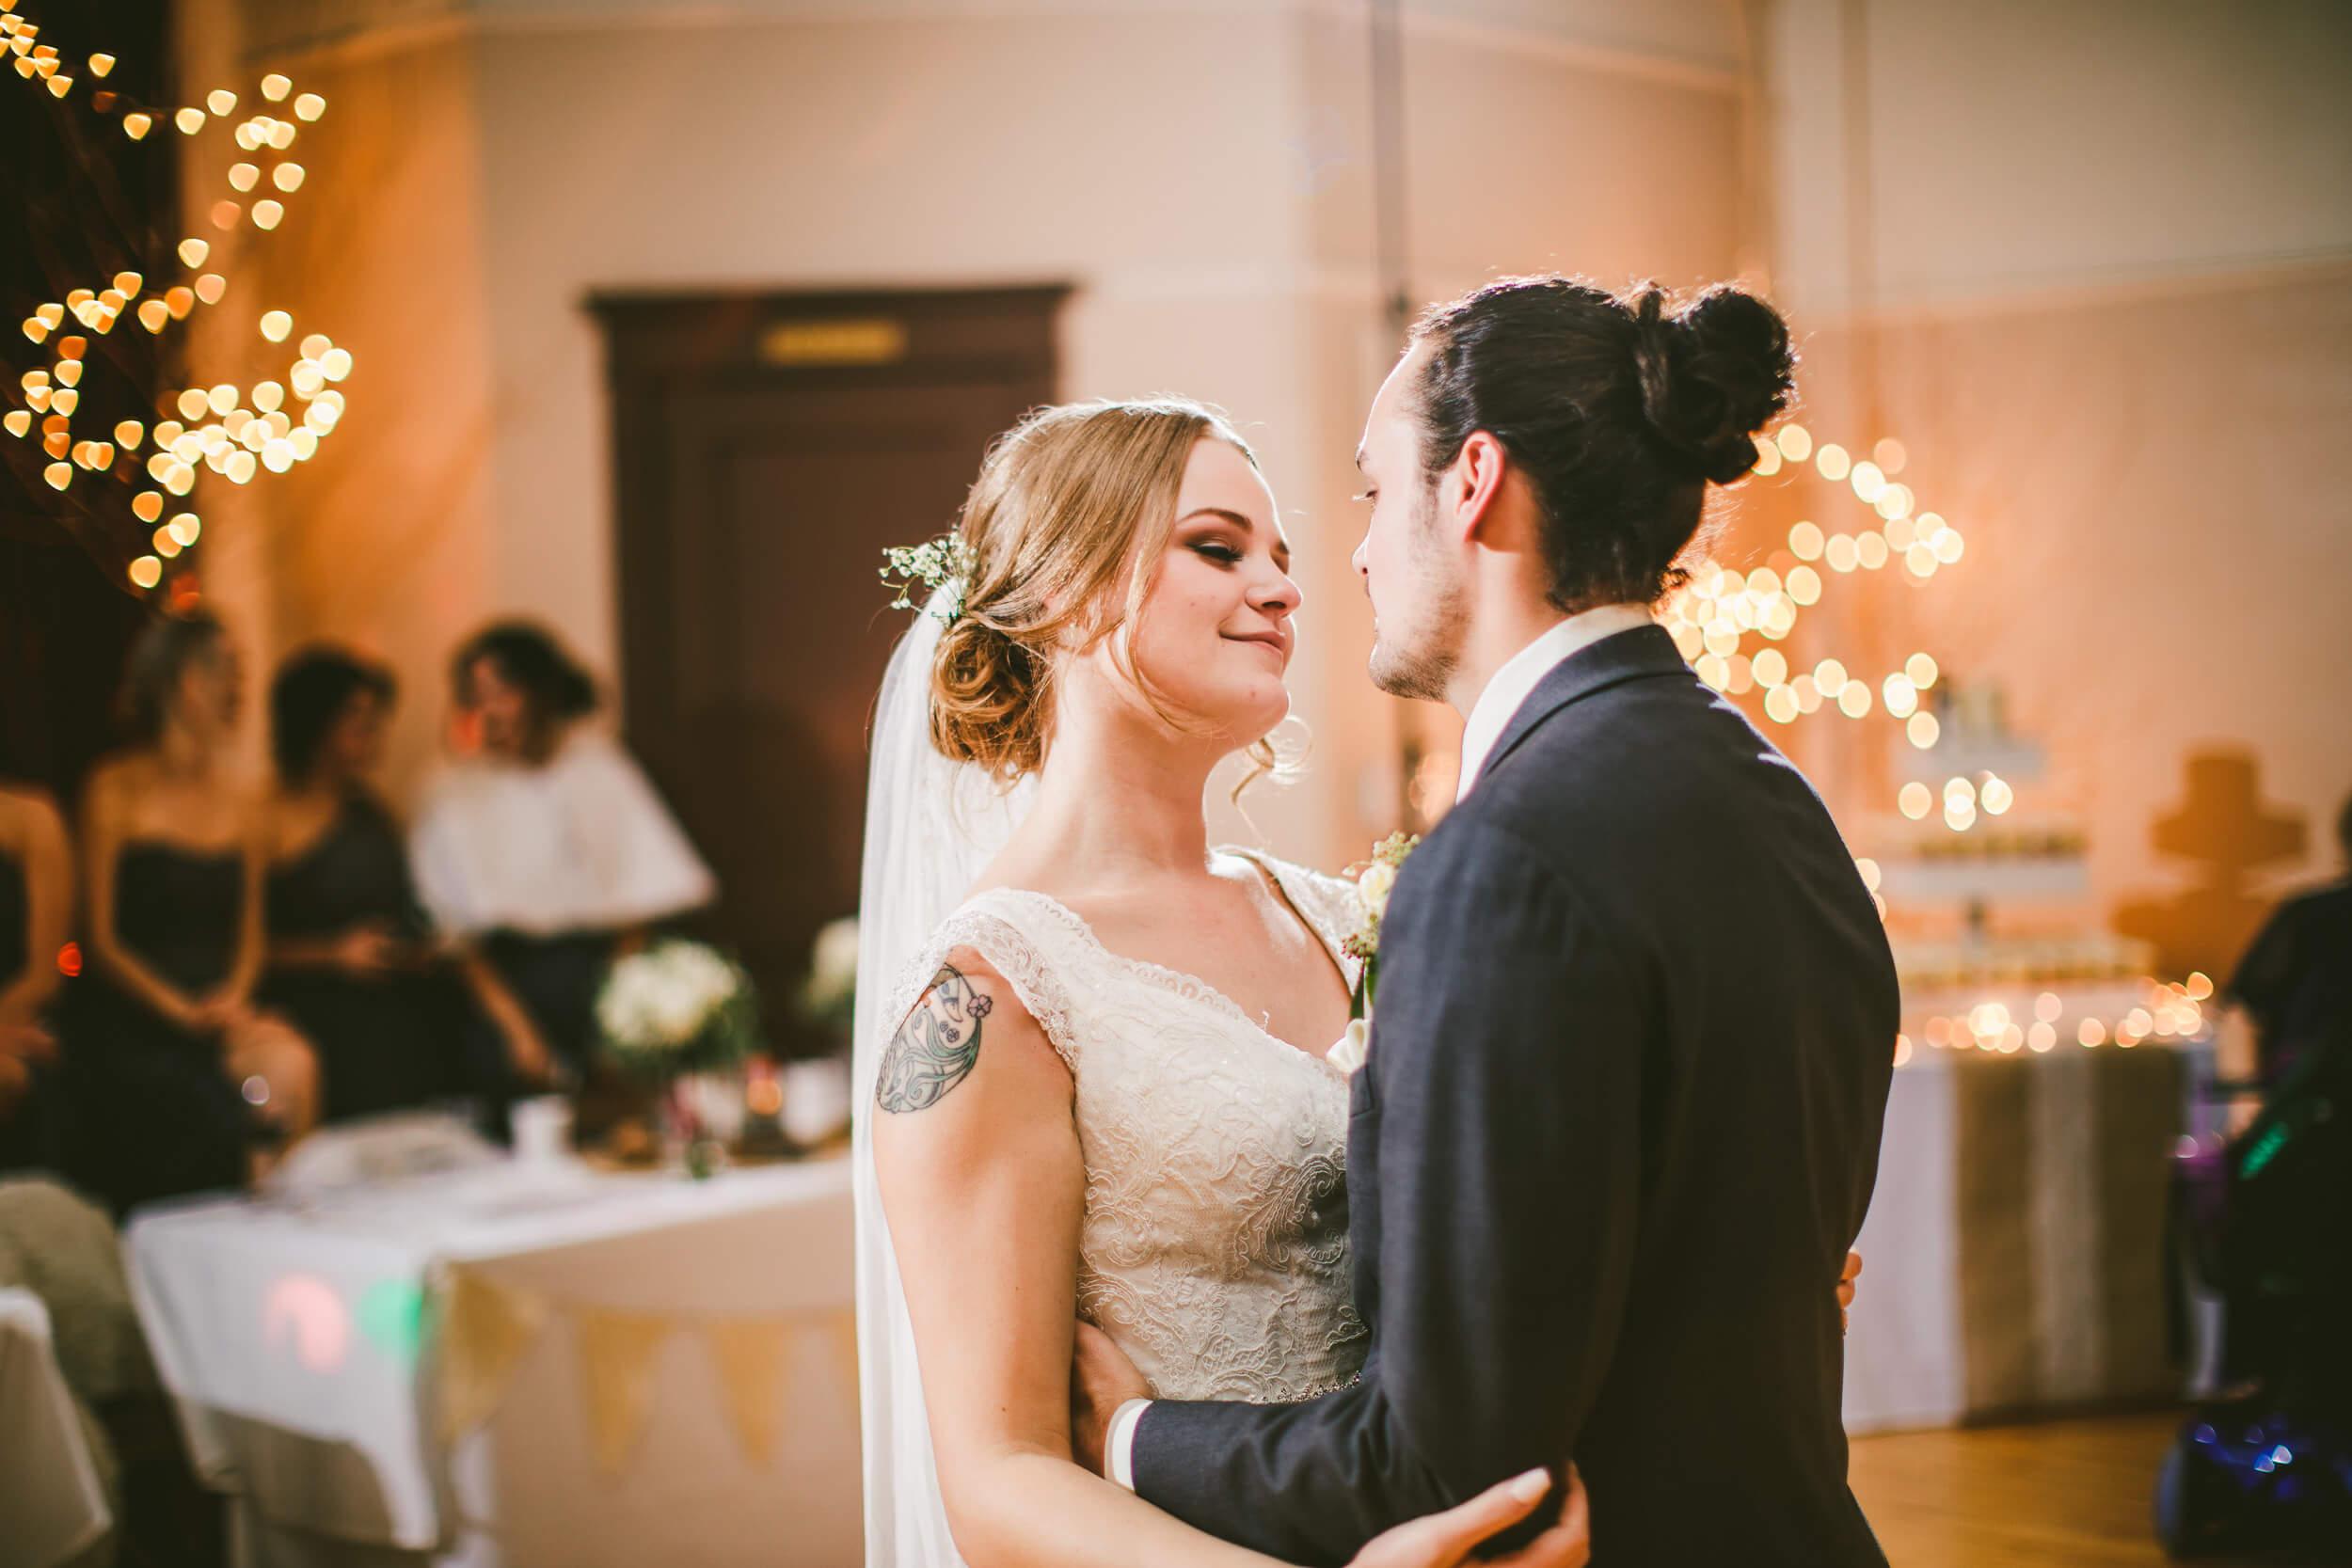 mukogawa winter wedding in spokane (276).jpg